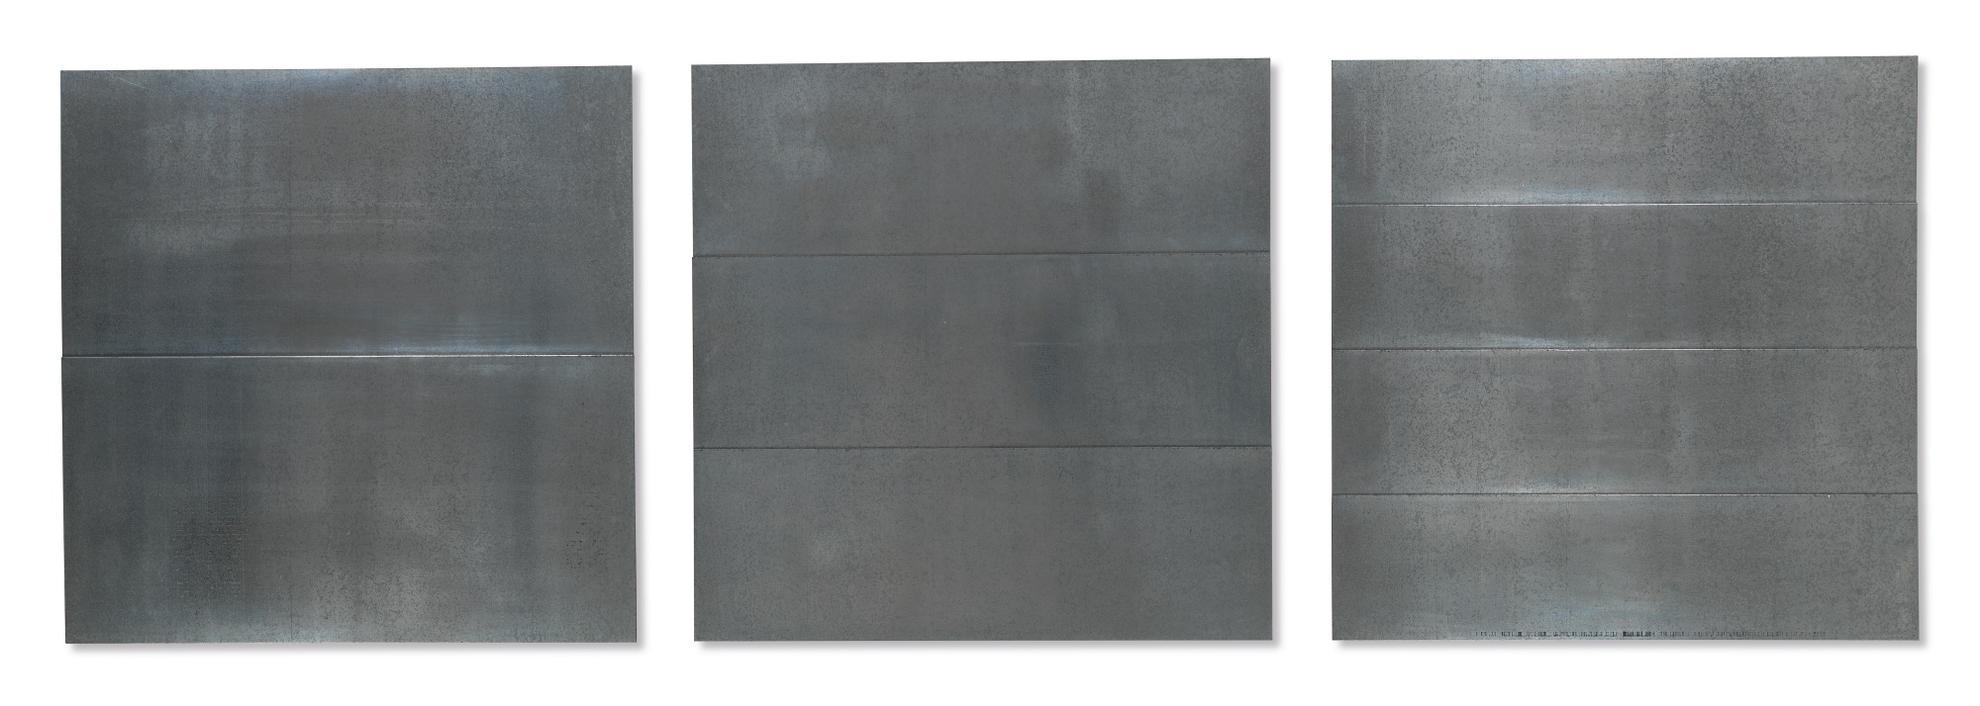 Donald Judd-Untitled [Three Works]-1983